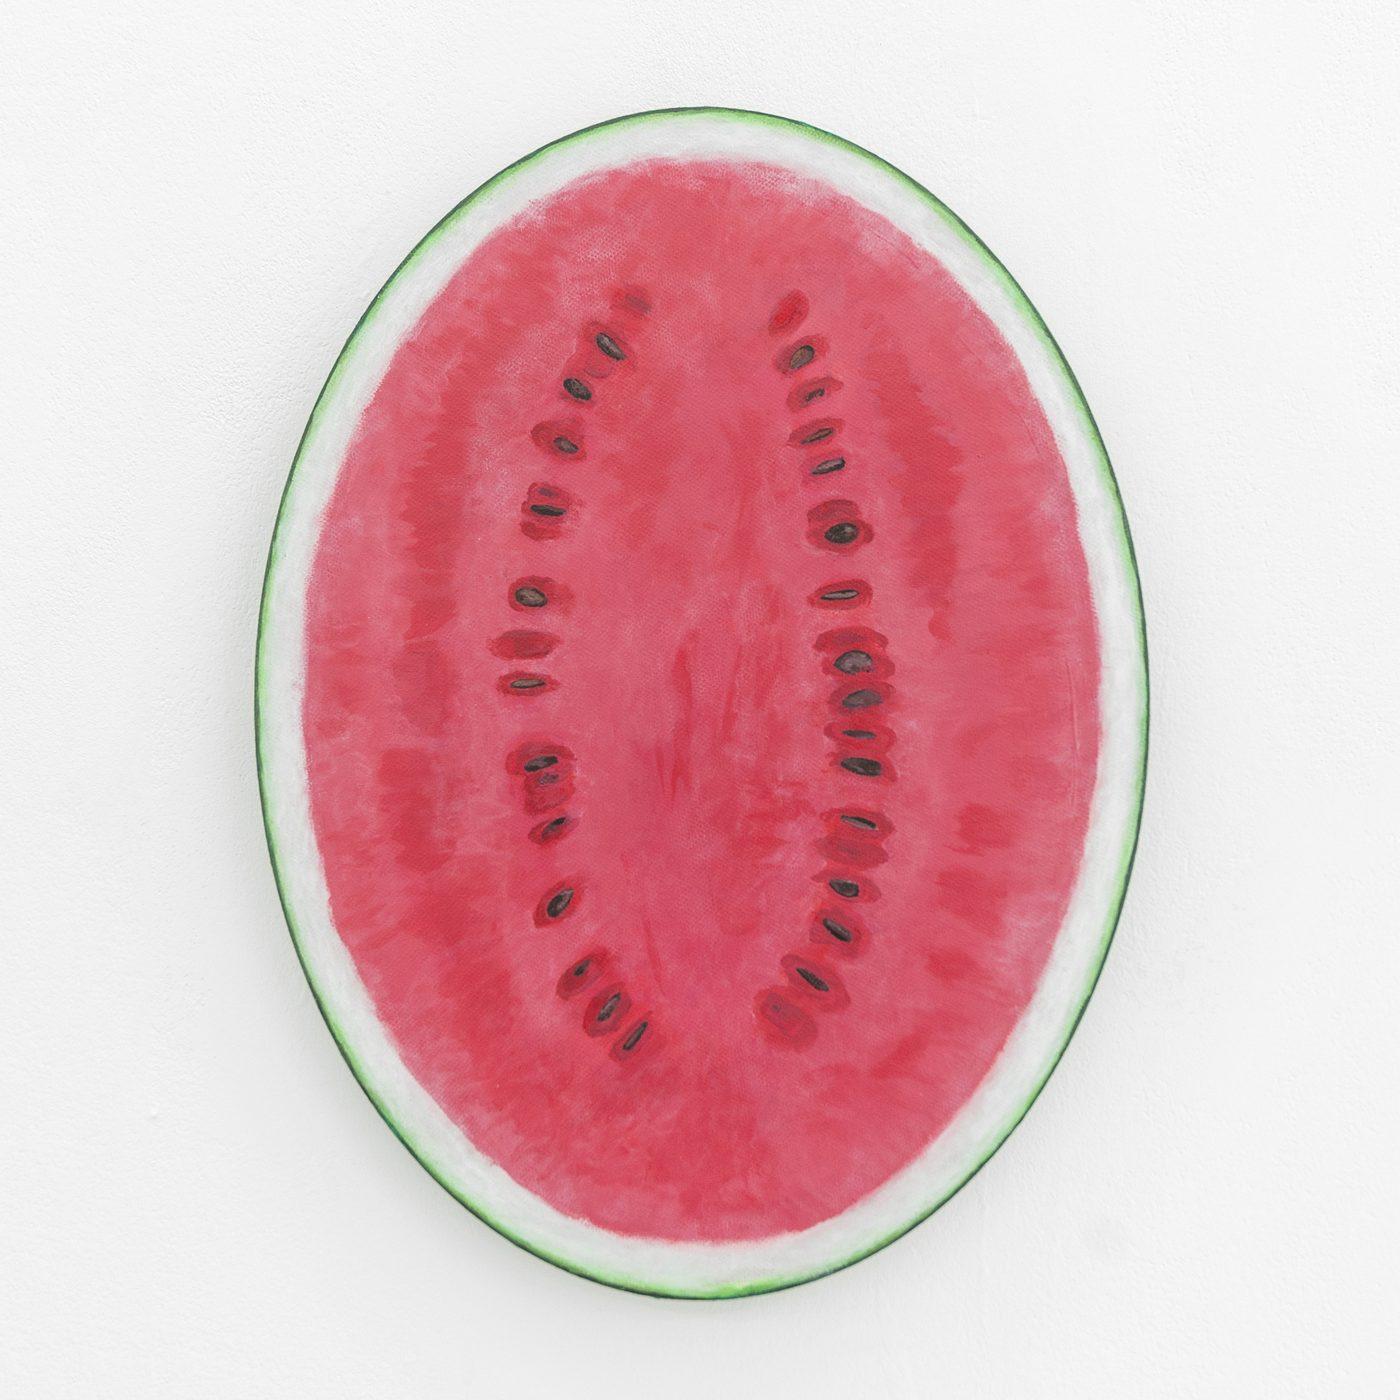 4.Watermelon